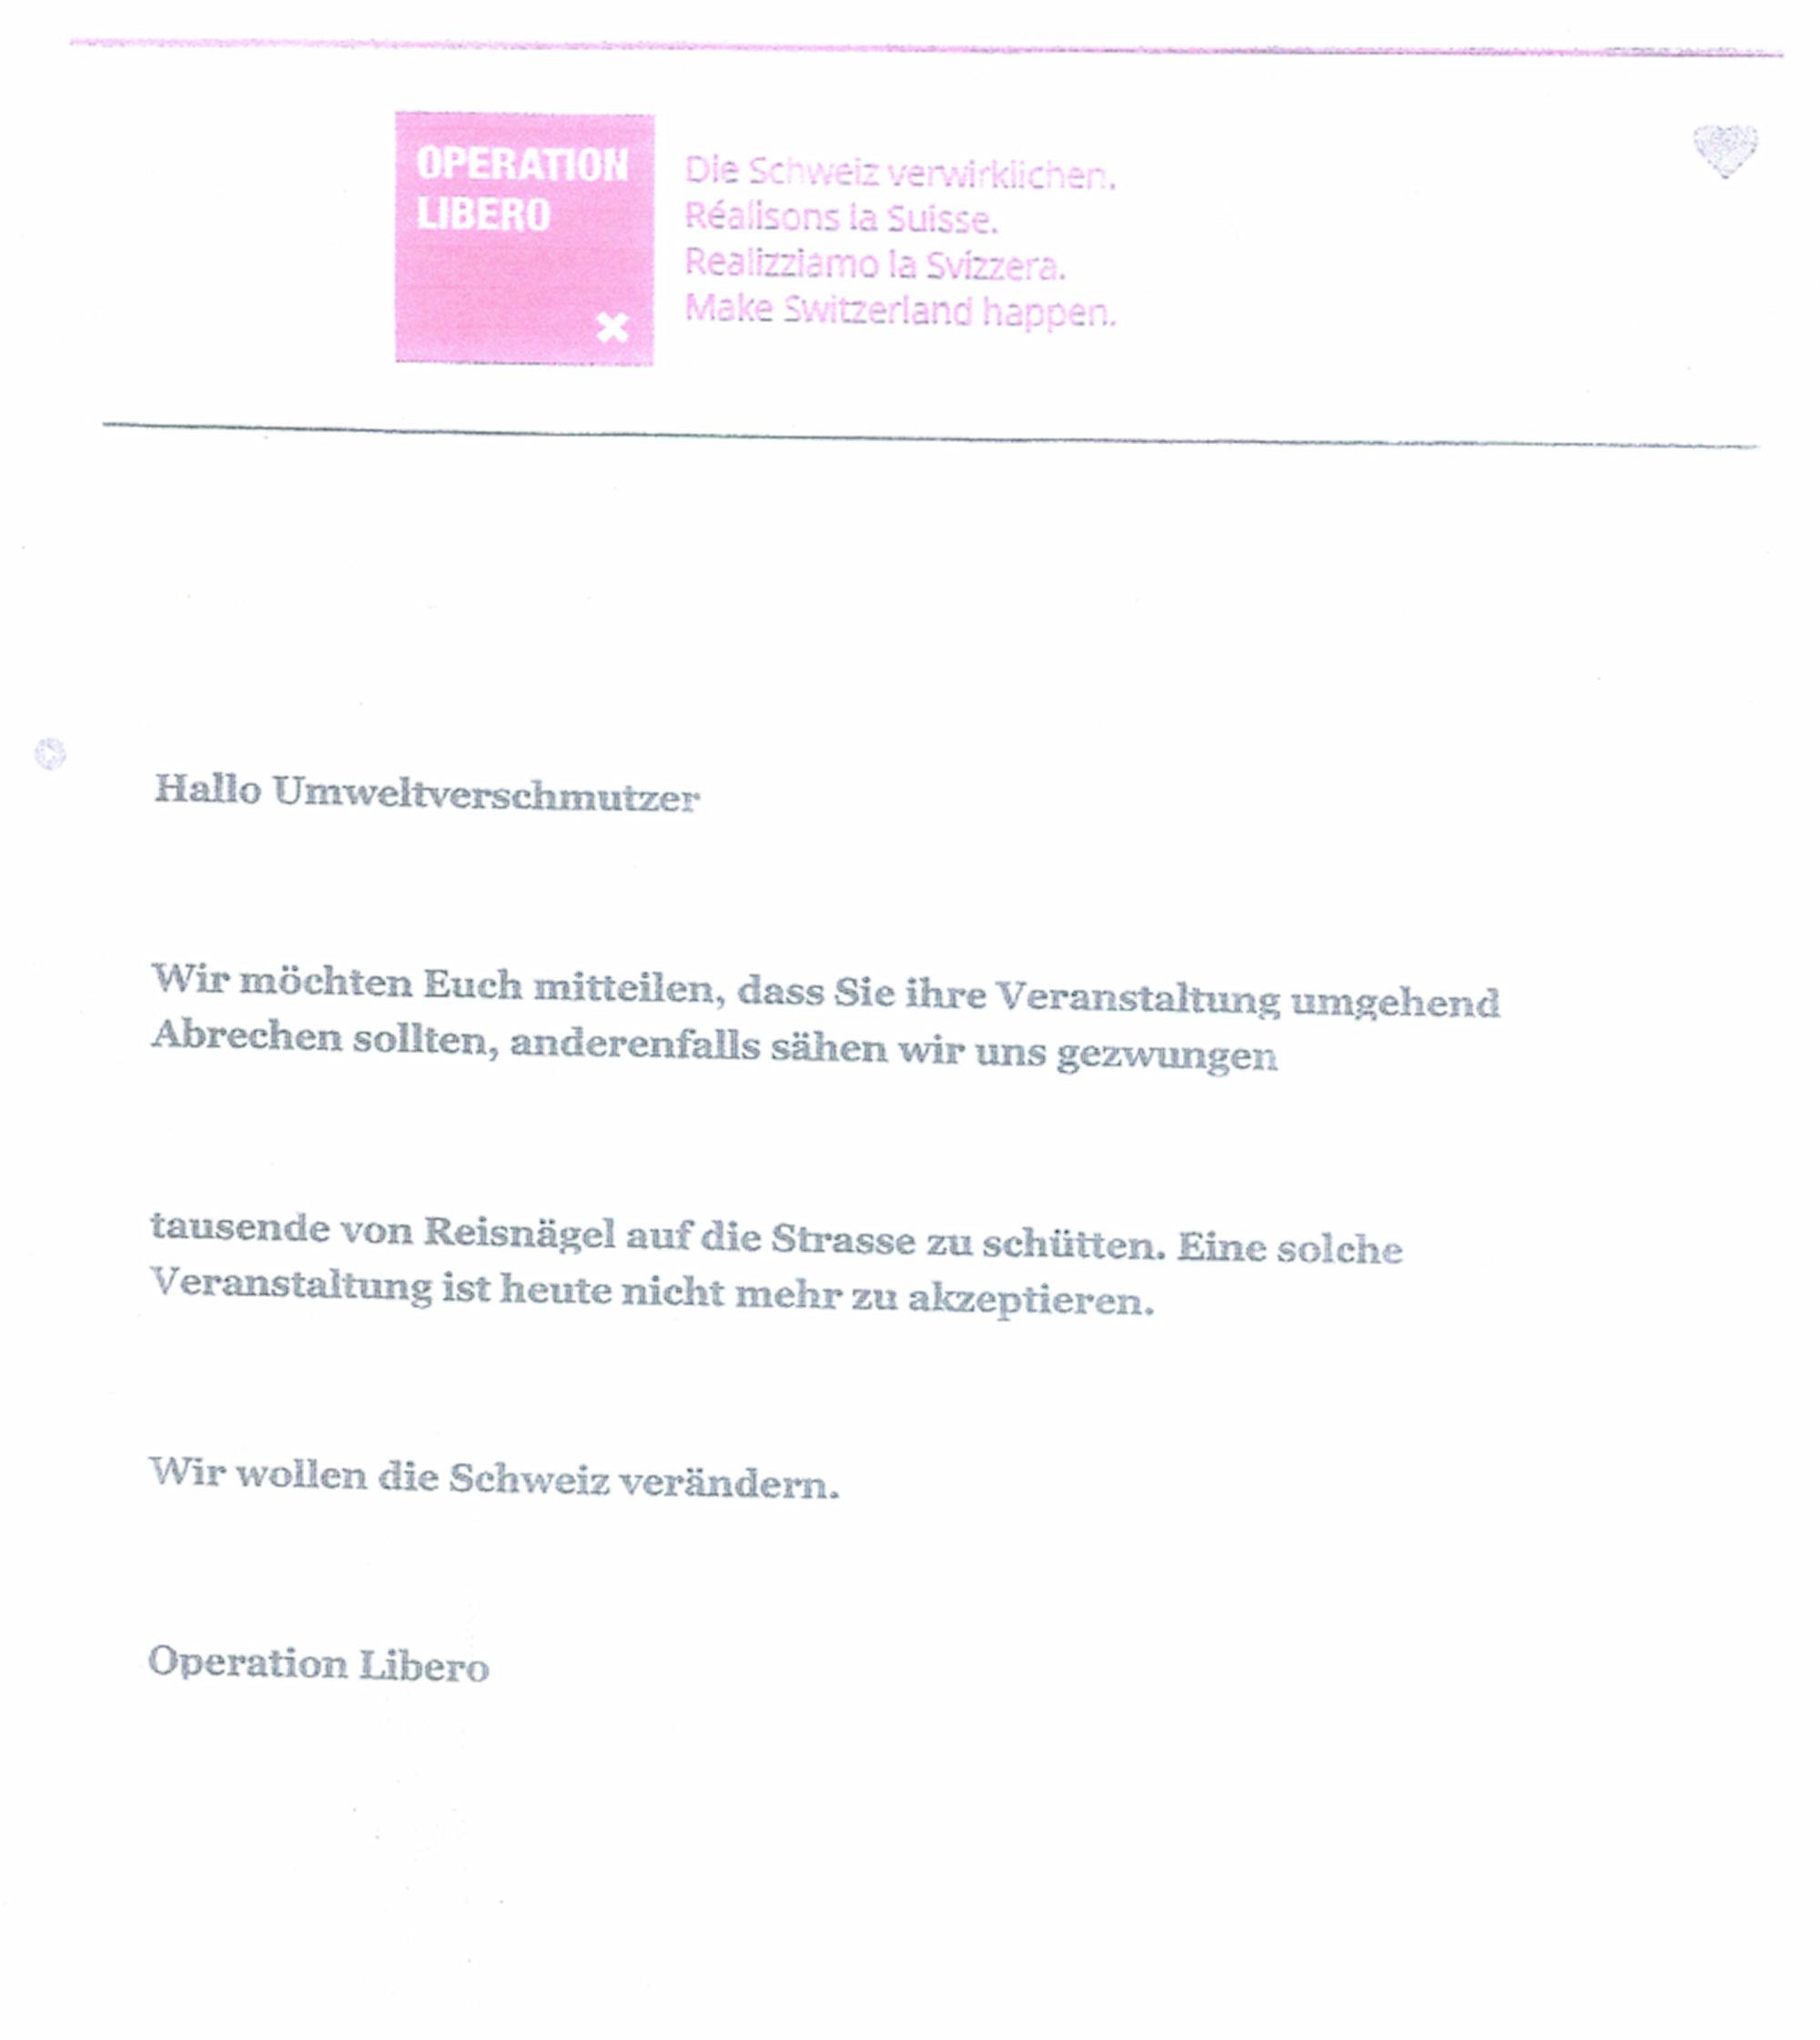 Operation, Libero, Bergsprint, Walzenhausen, Lachen, 2019